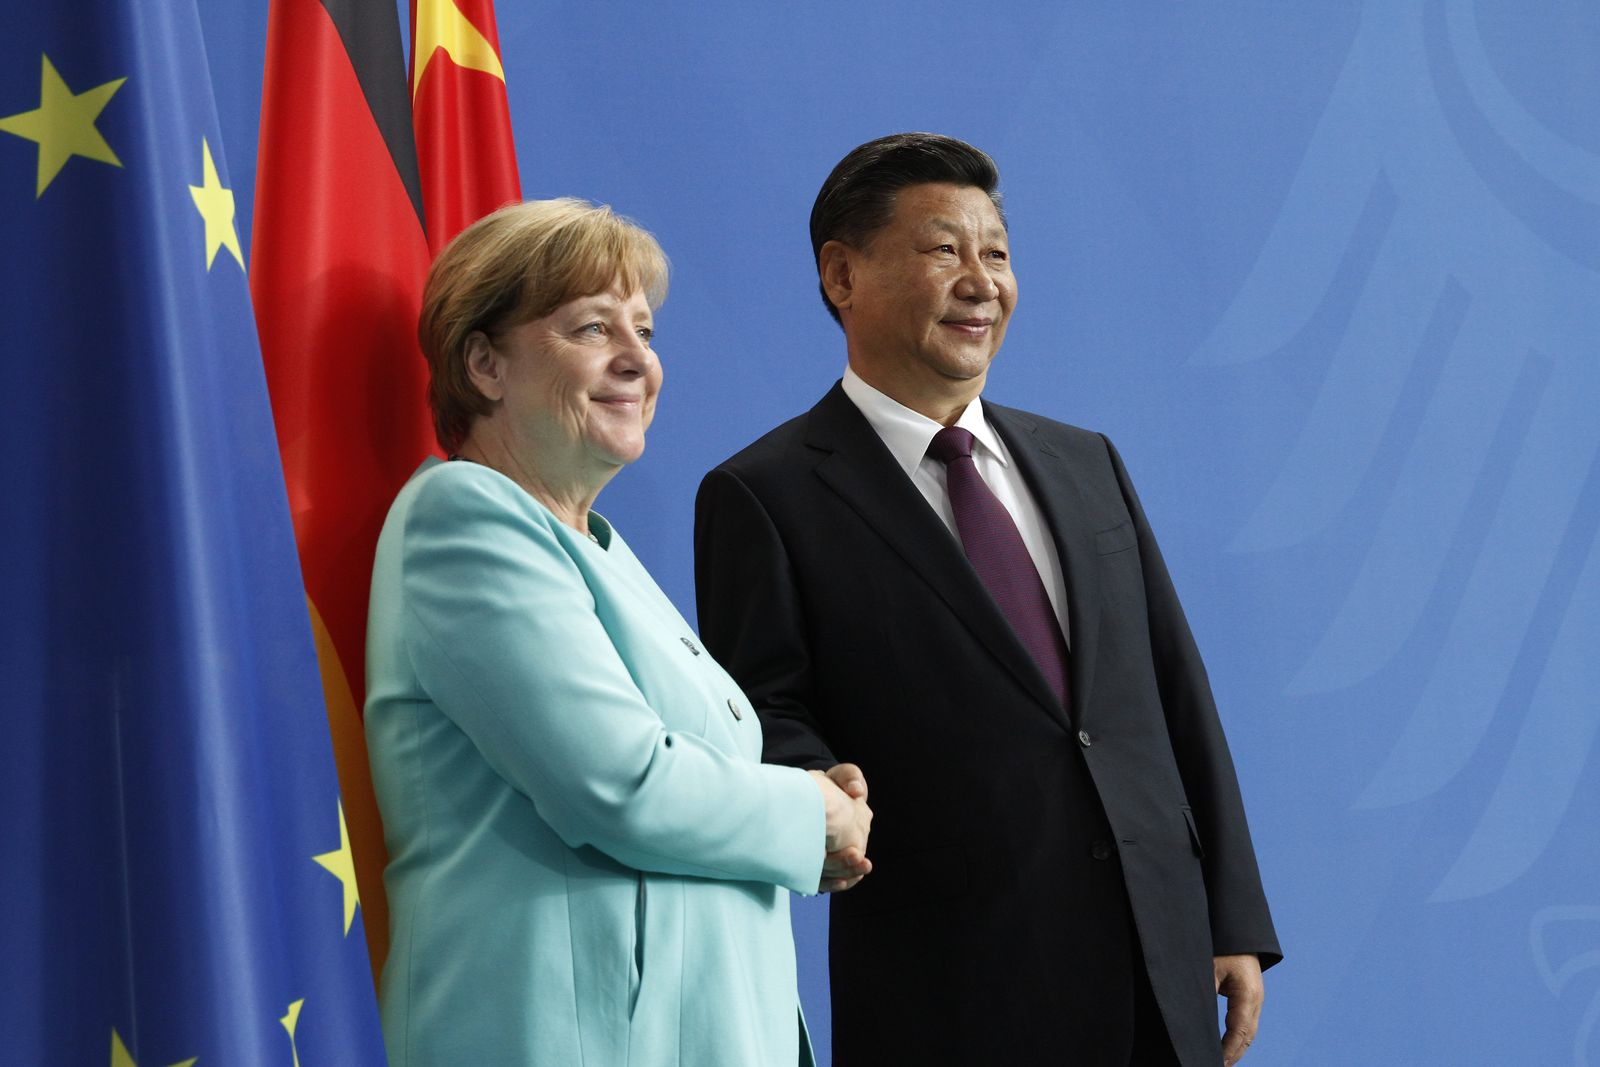 Angela Merkel / Xi Jinping